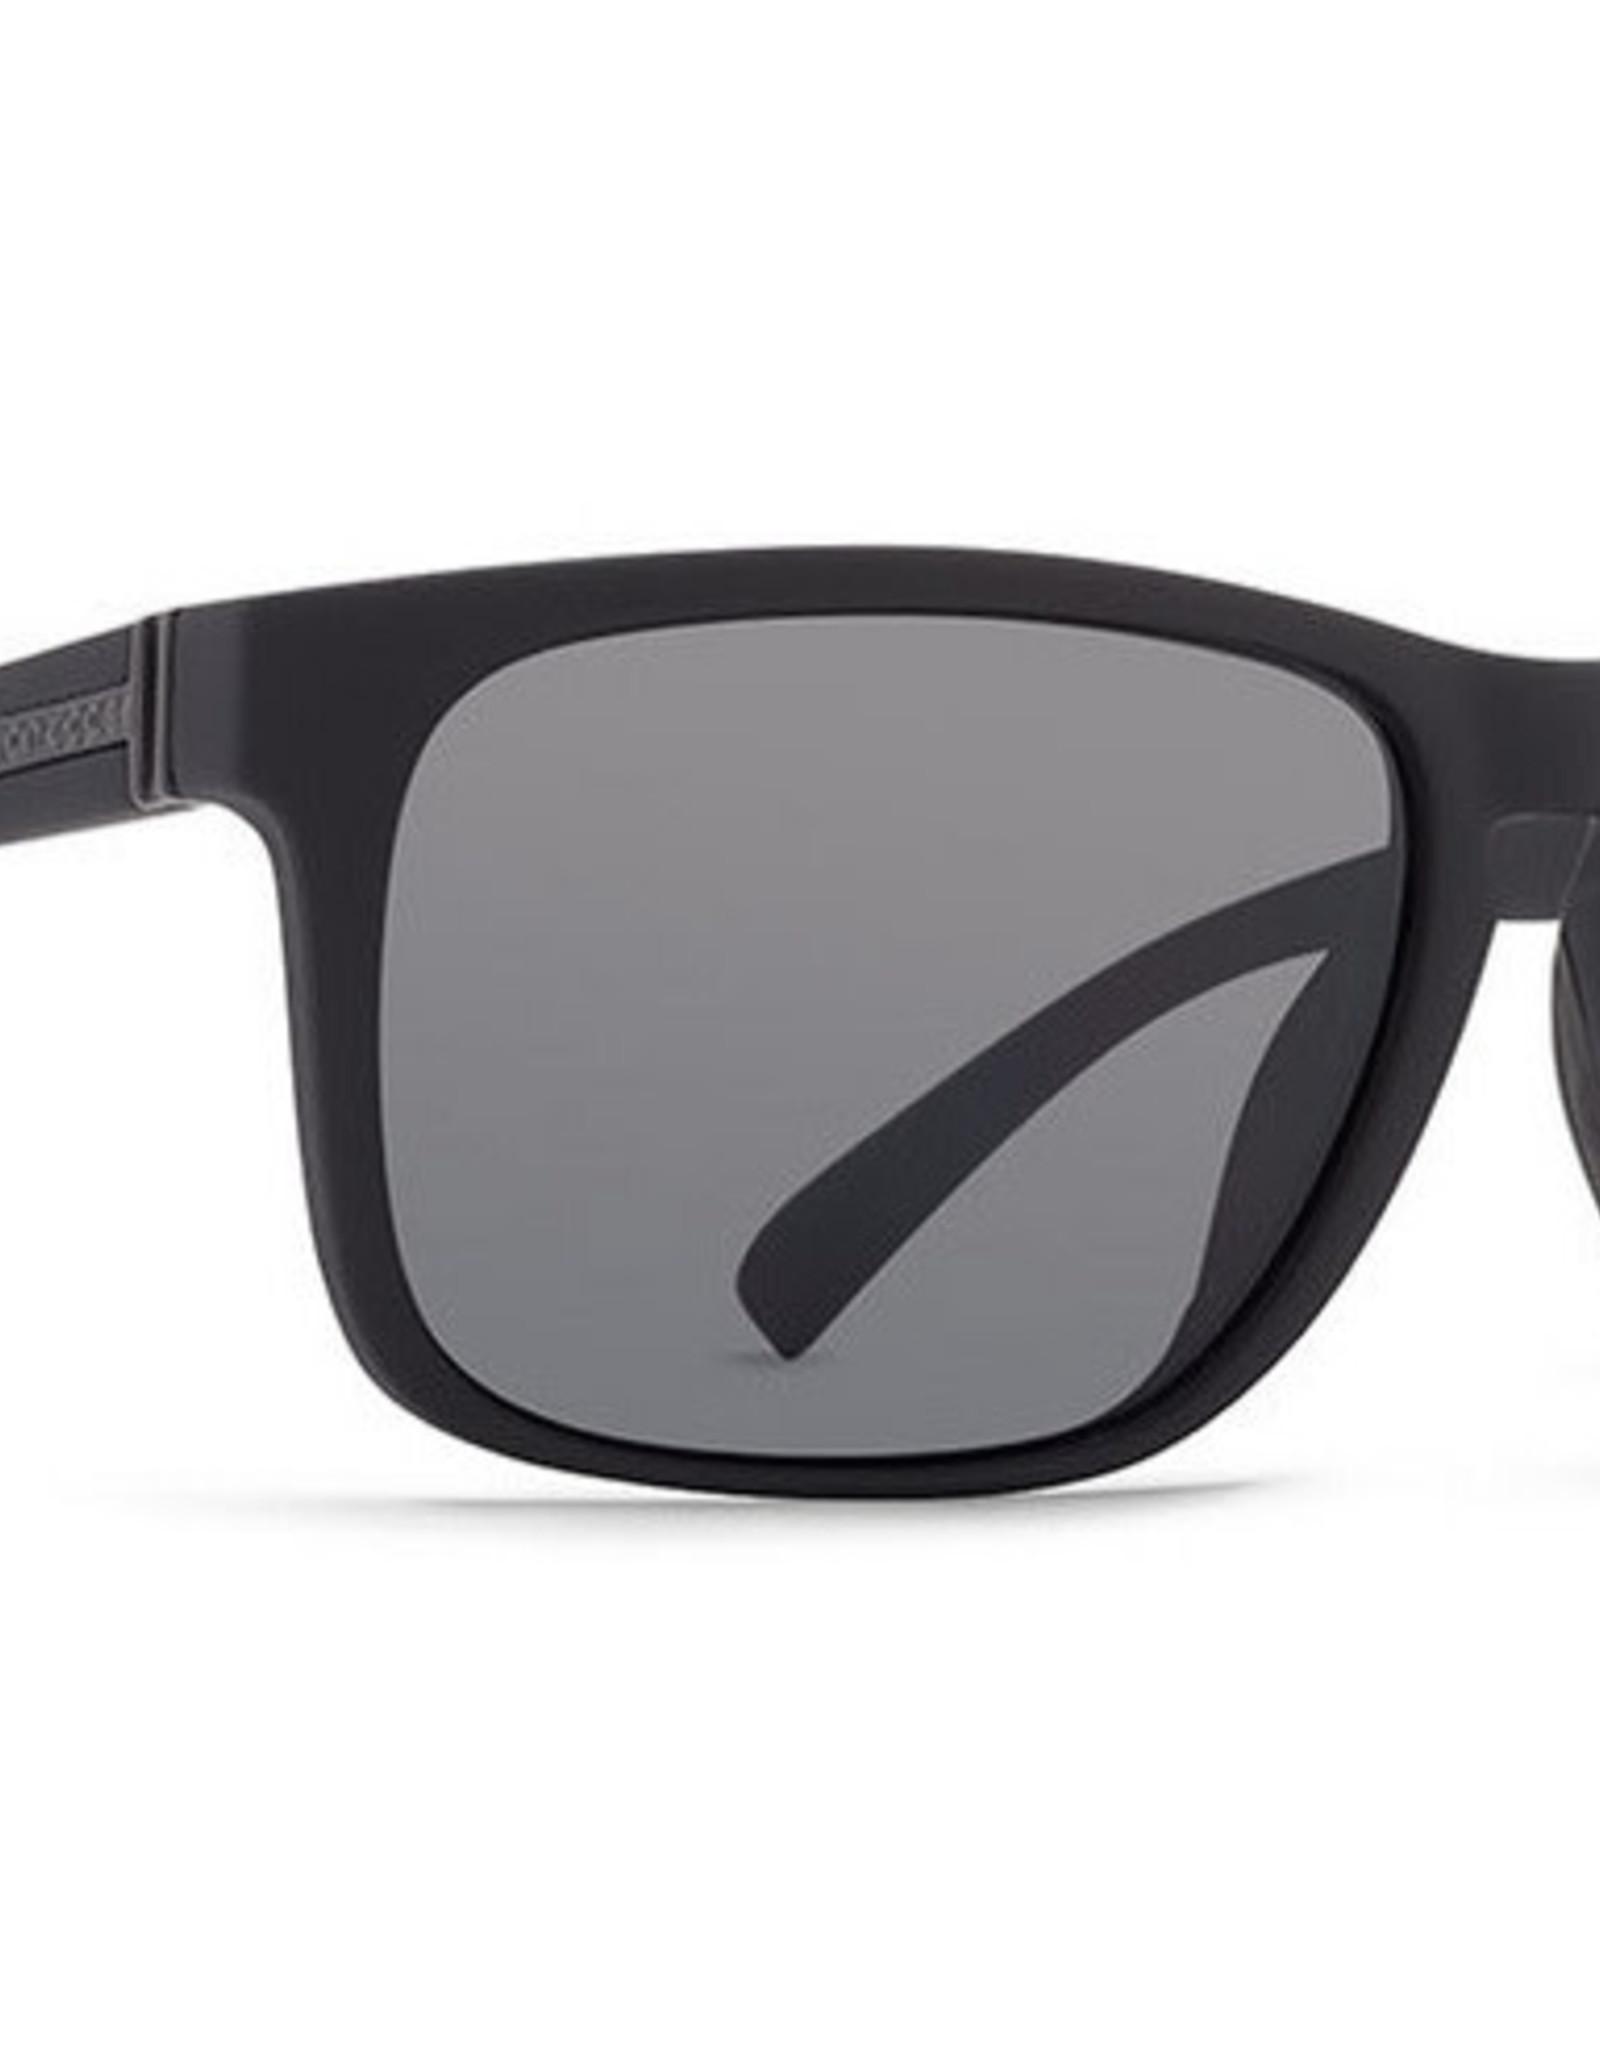 Von Zipper VZ - LOMAX - Black Satin w/ Grey